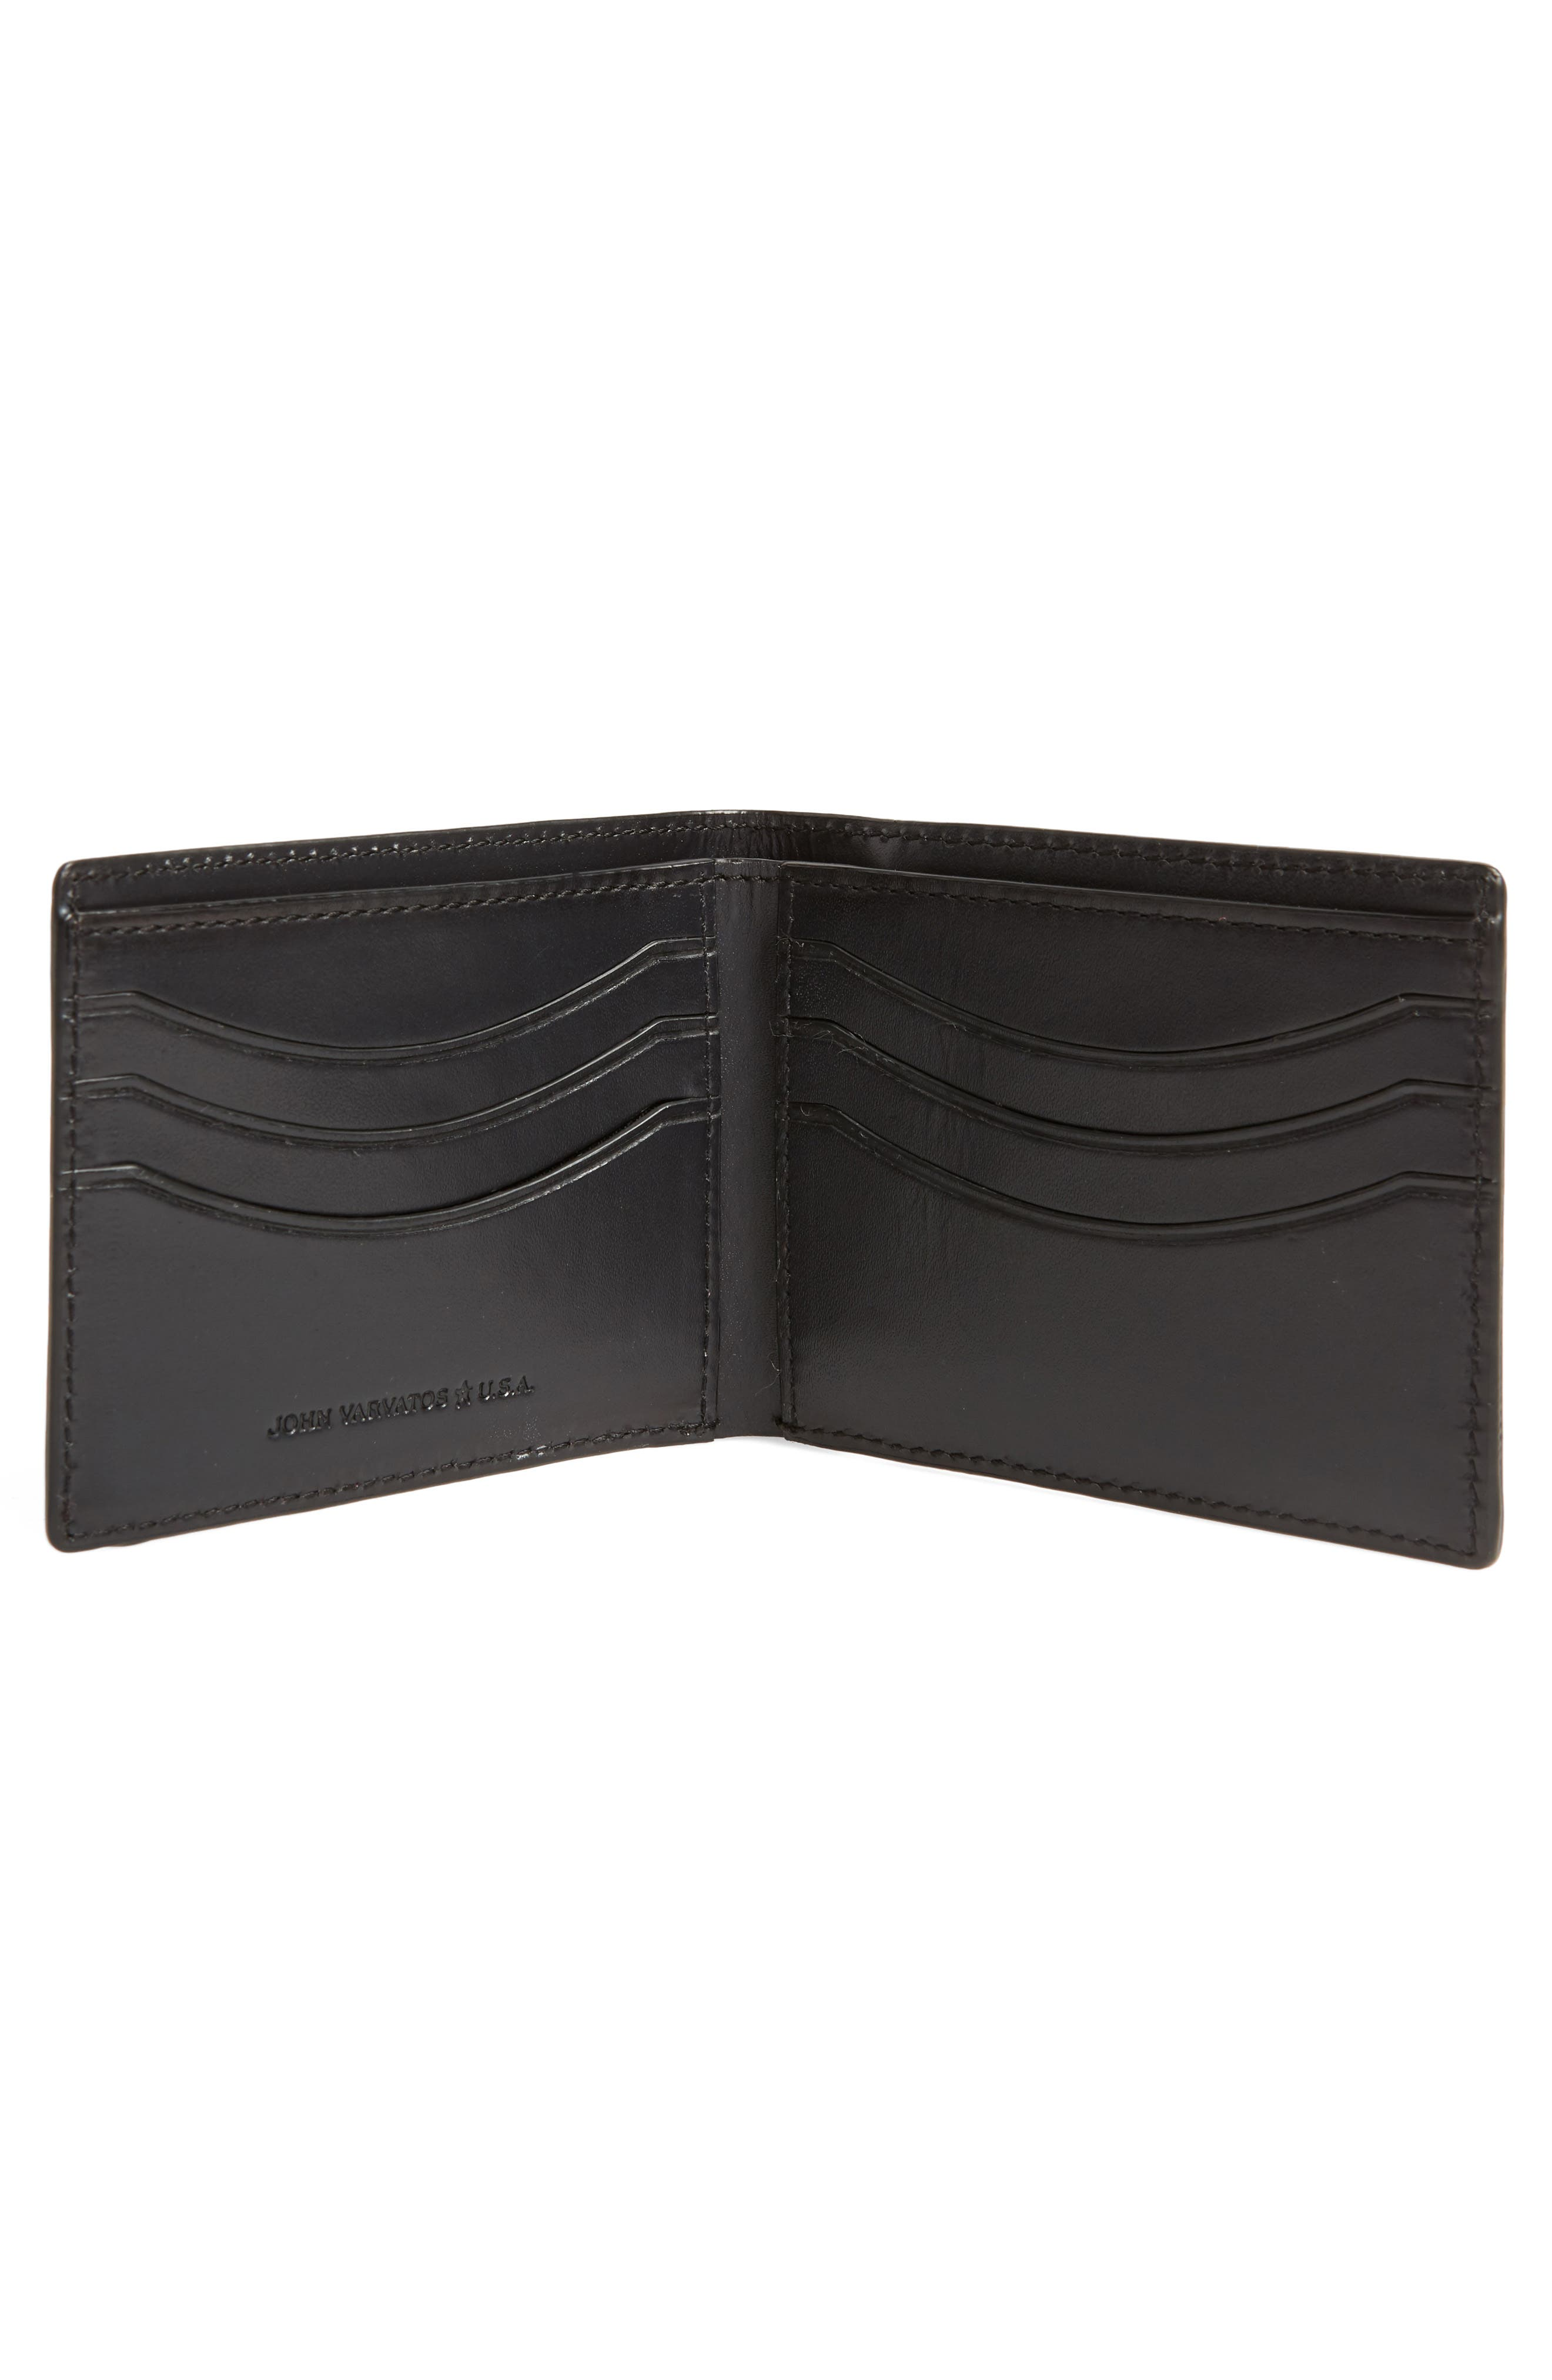 Bifold Leather Wallet,                             Alternate thumbnail 2, color,                             Black